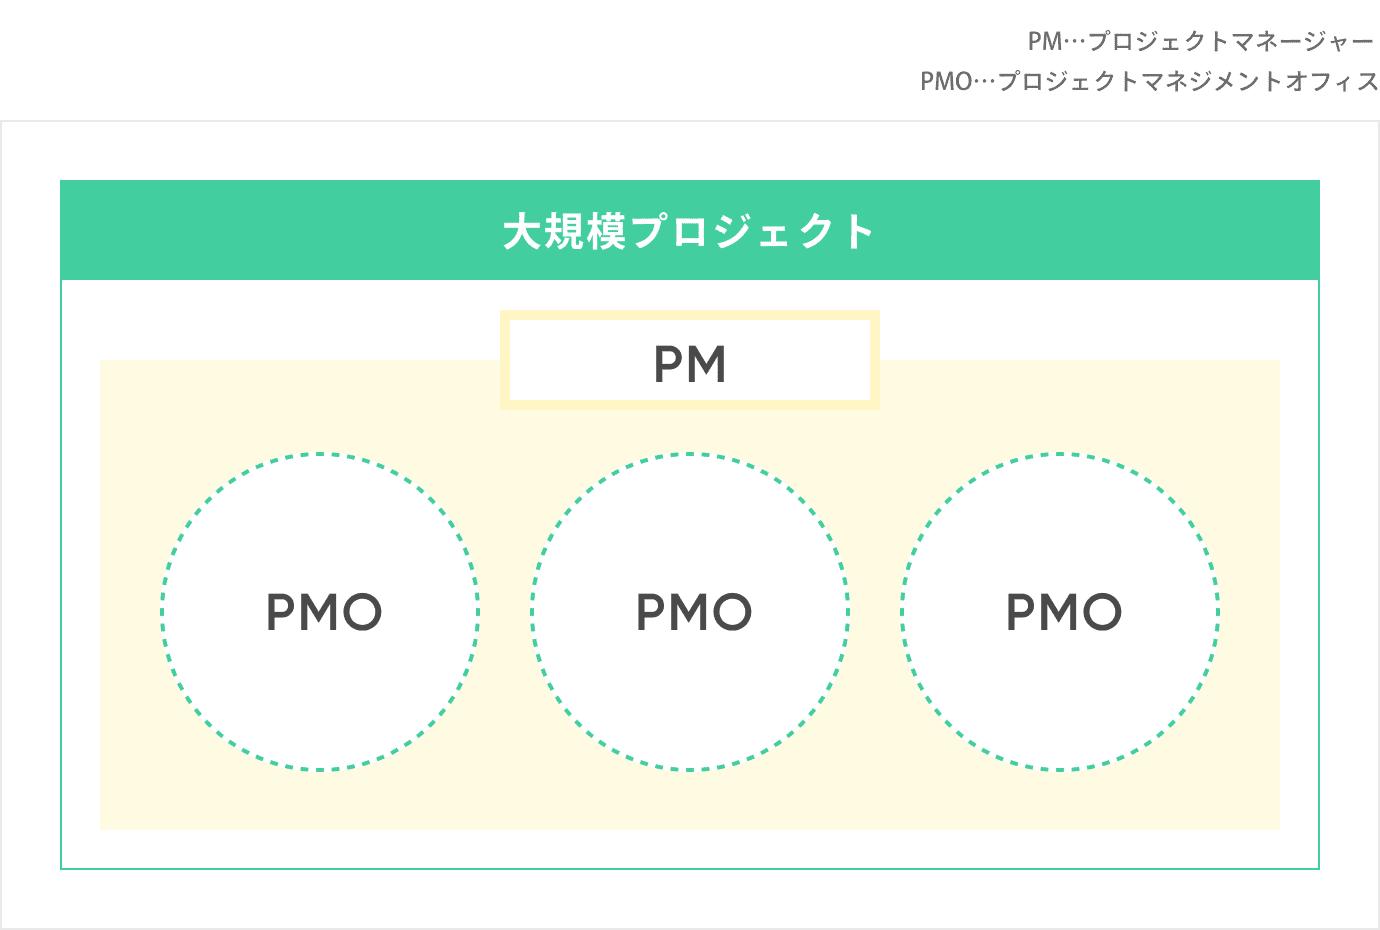 PMOとは?PMとの違い(意味、役割、業務内容)を紹介_プロジェクトマネジメントオフィスとプロジェクトマネージャーの違い